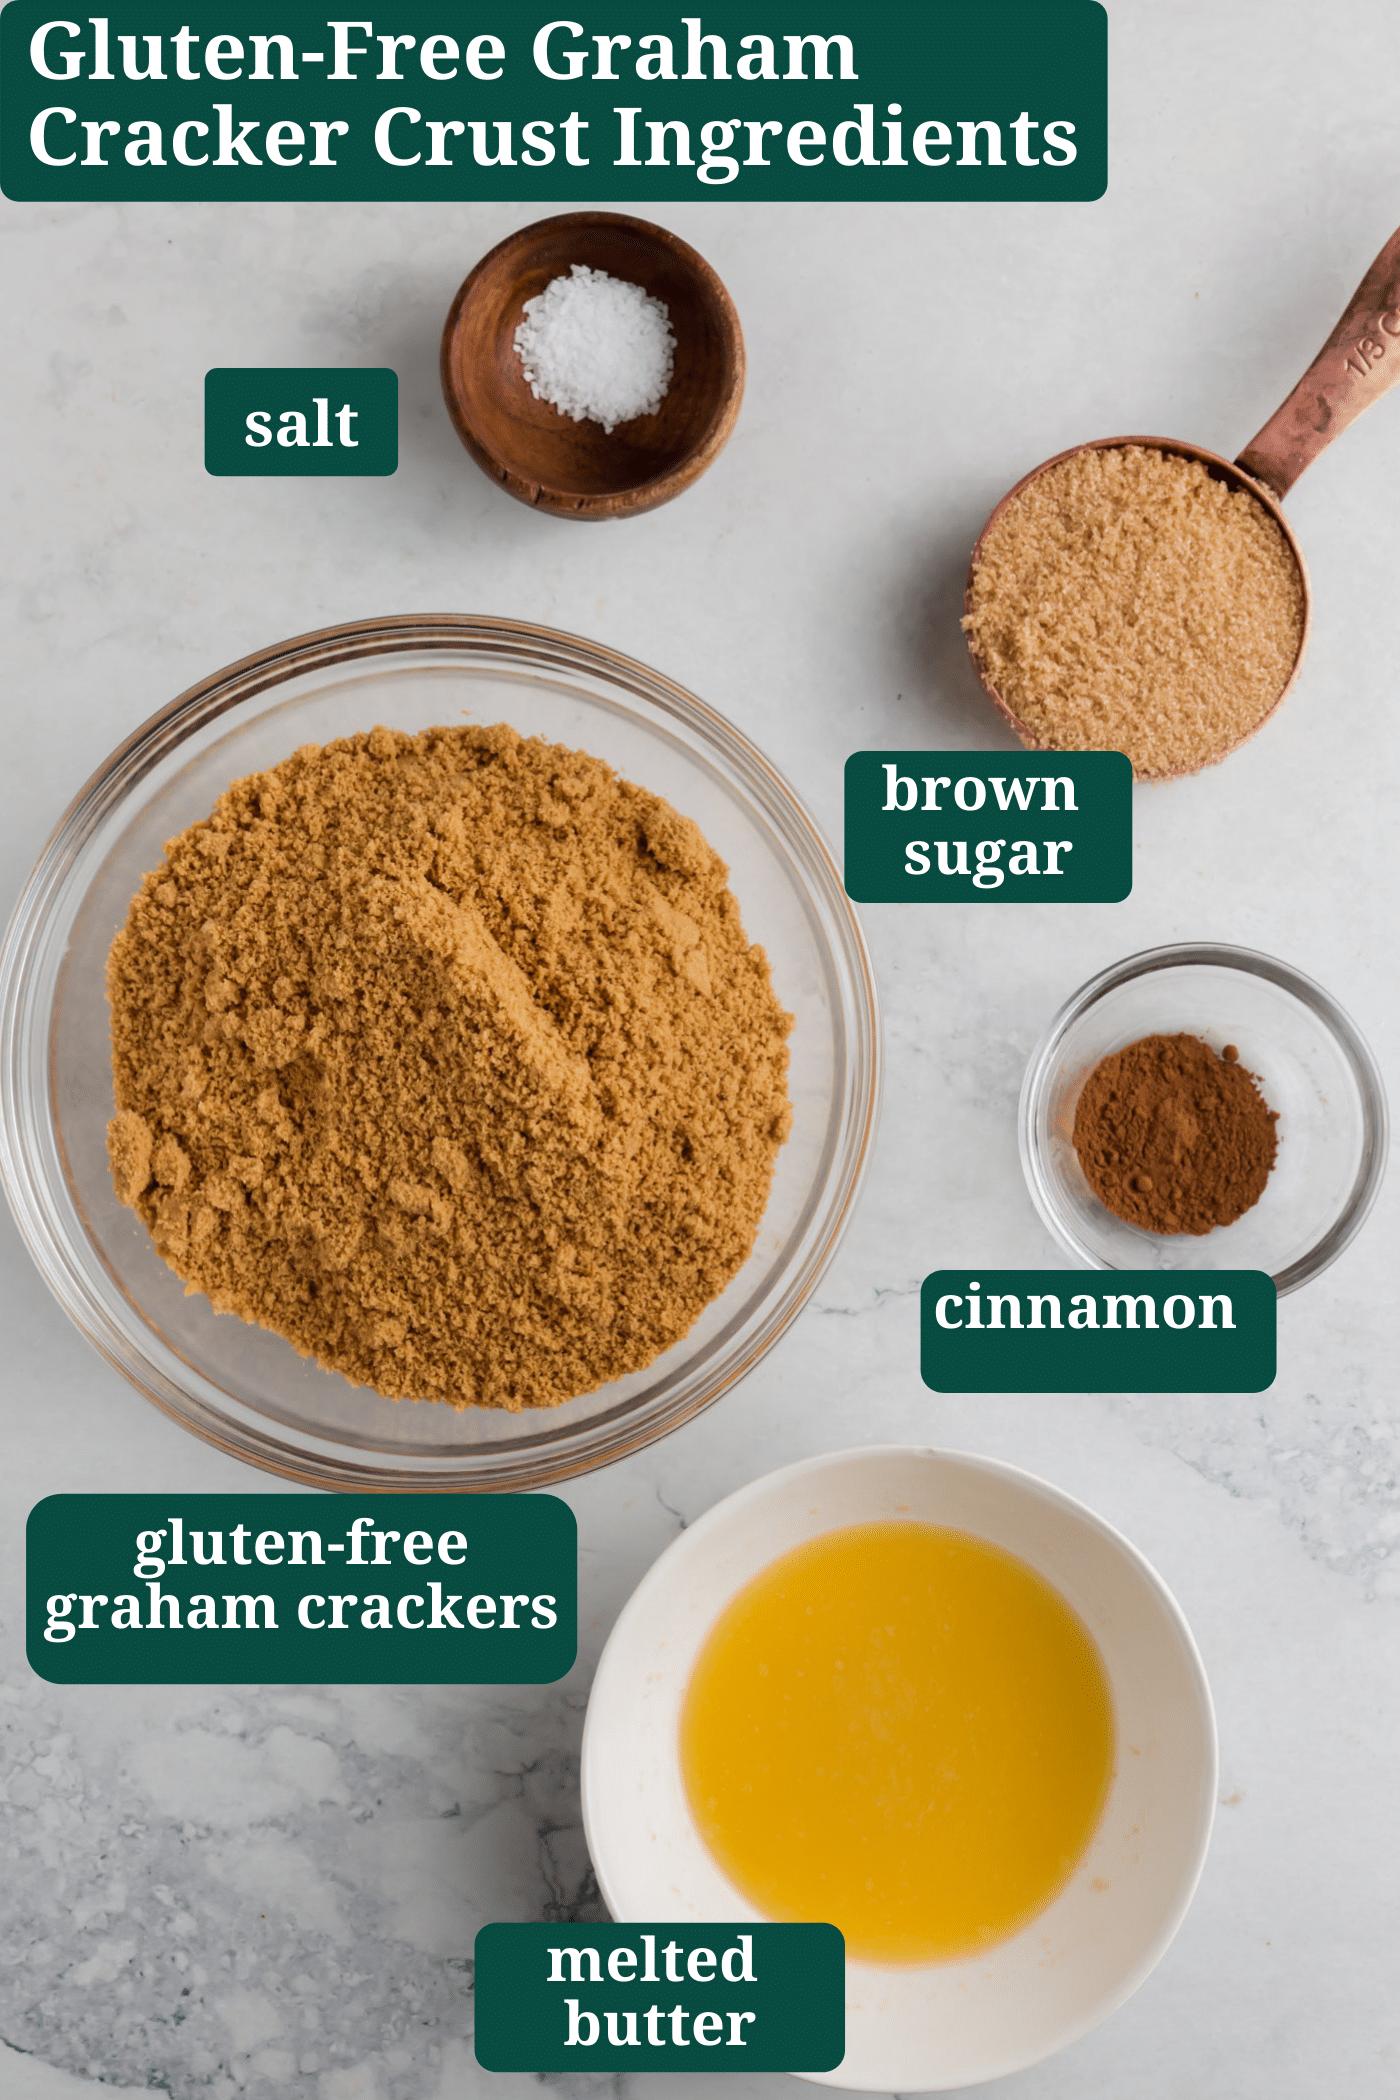 An overhead photo showing the ingredients to make gluten-free graham cracker pie crust.